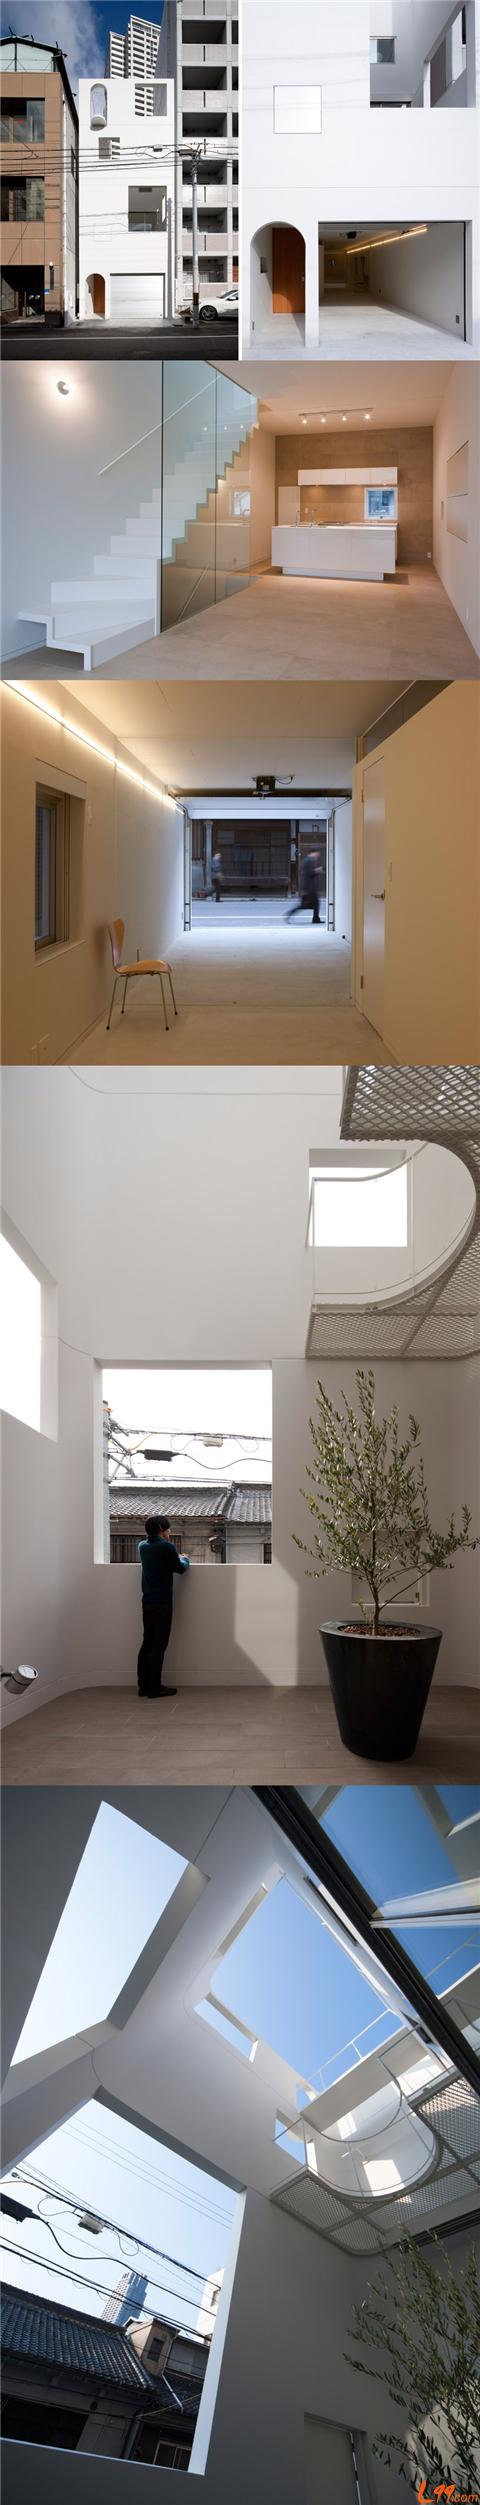 IKM house